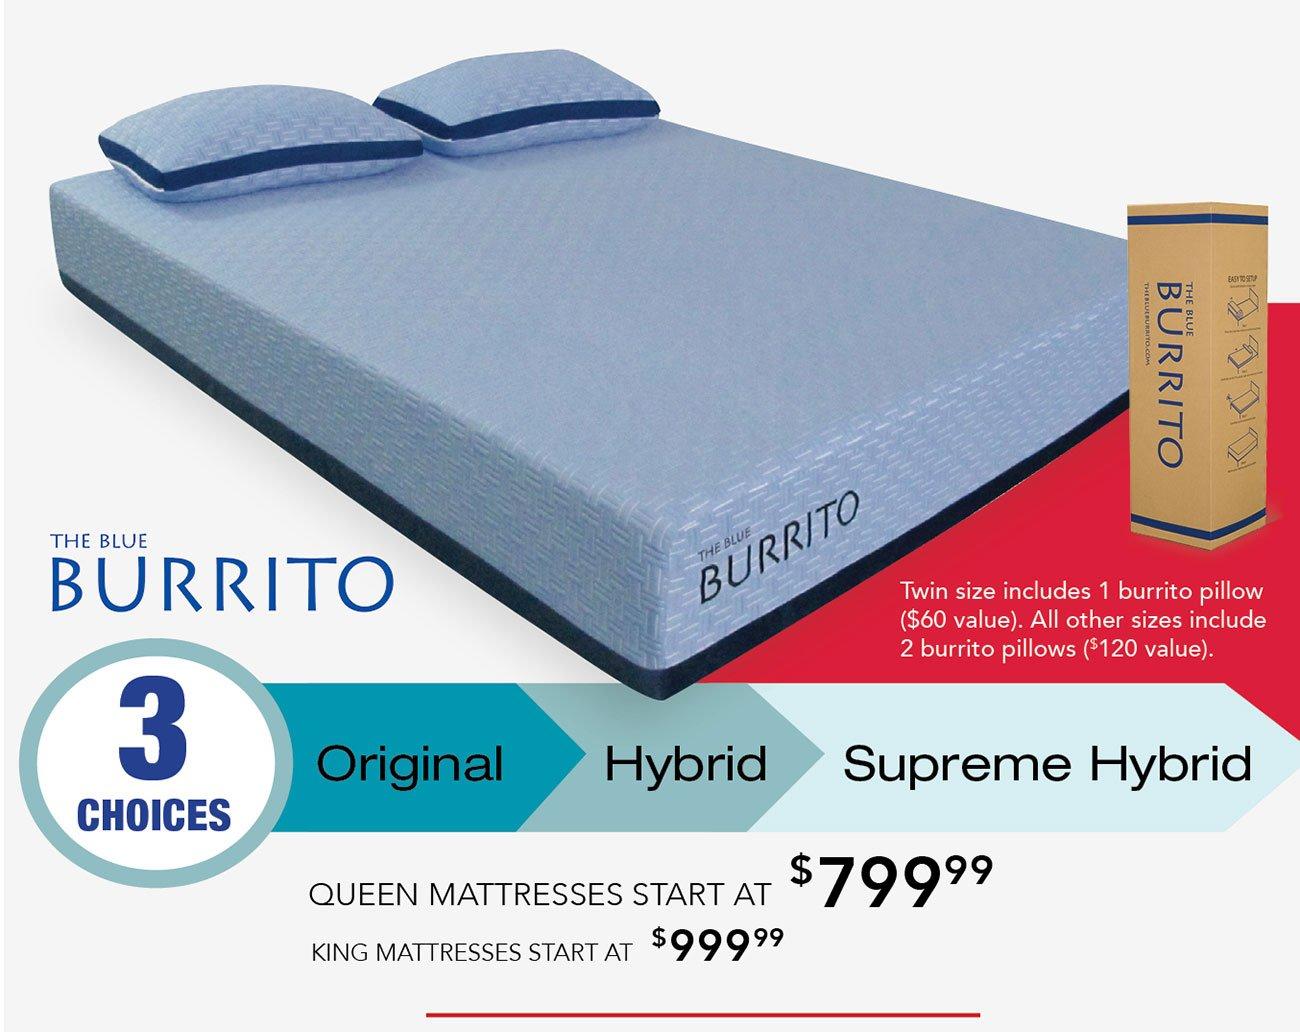 Blue-burrito-mattresses